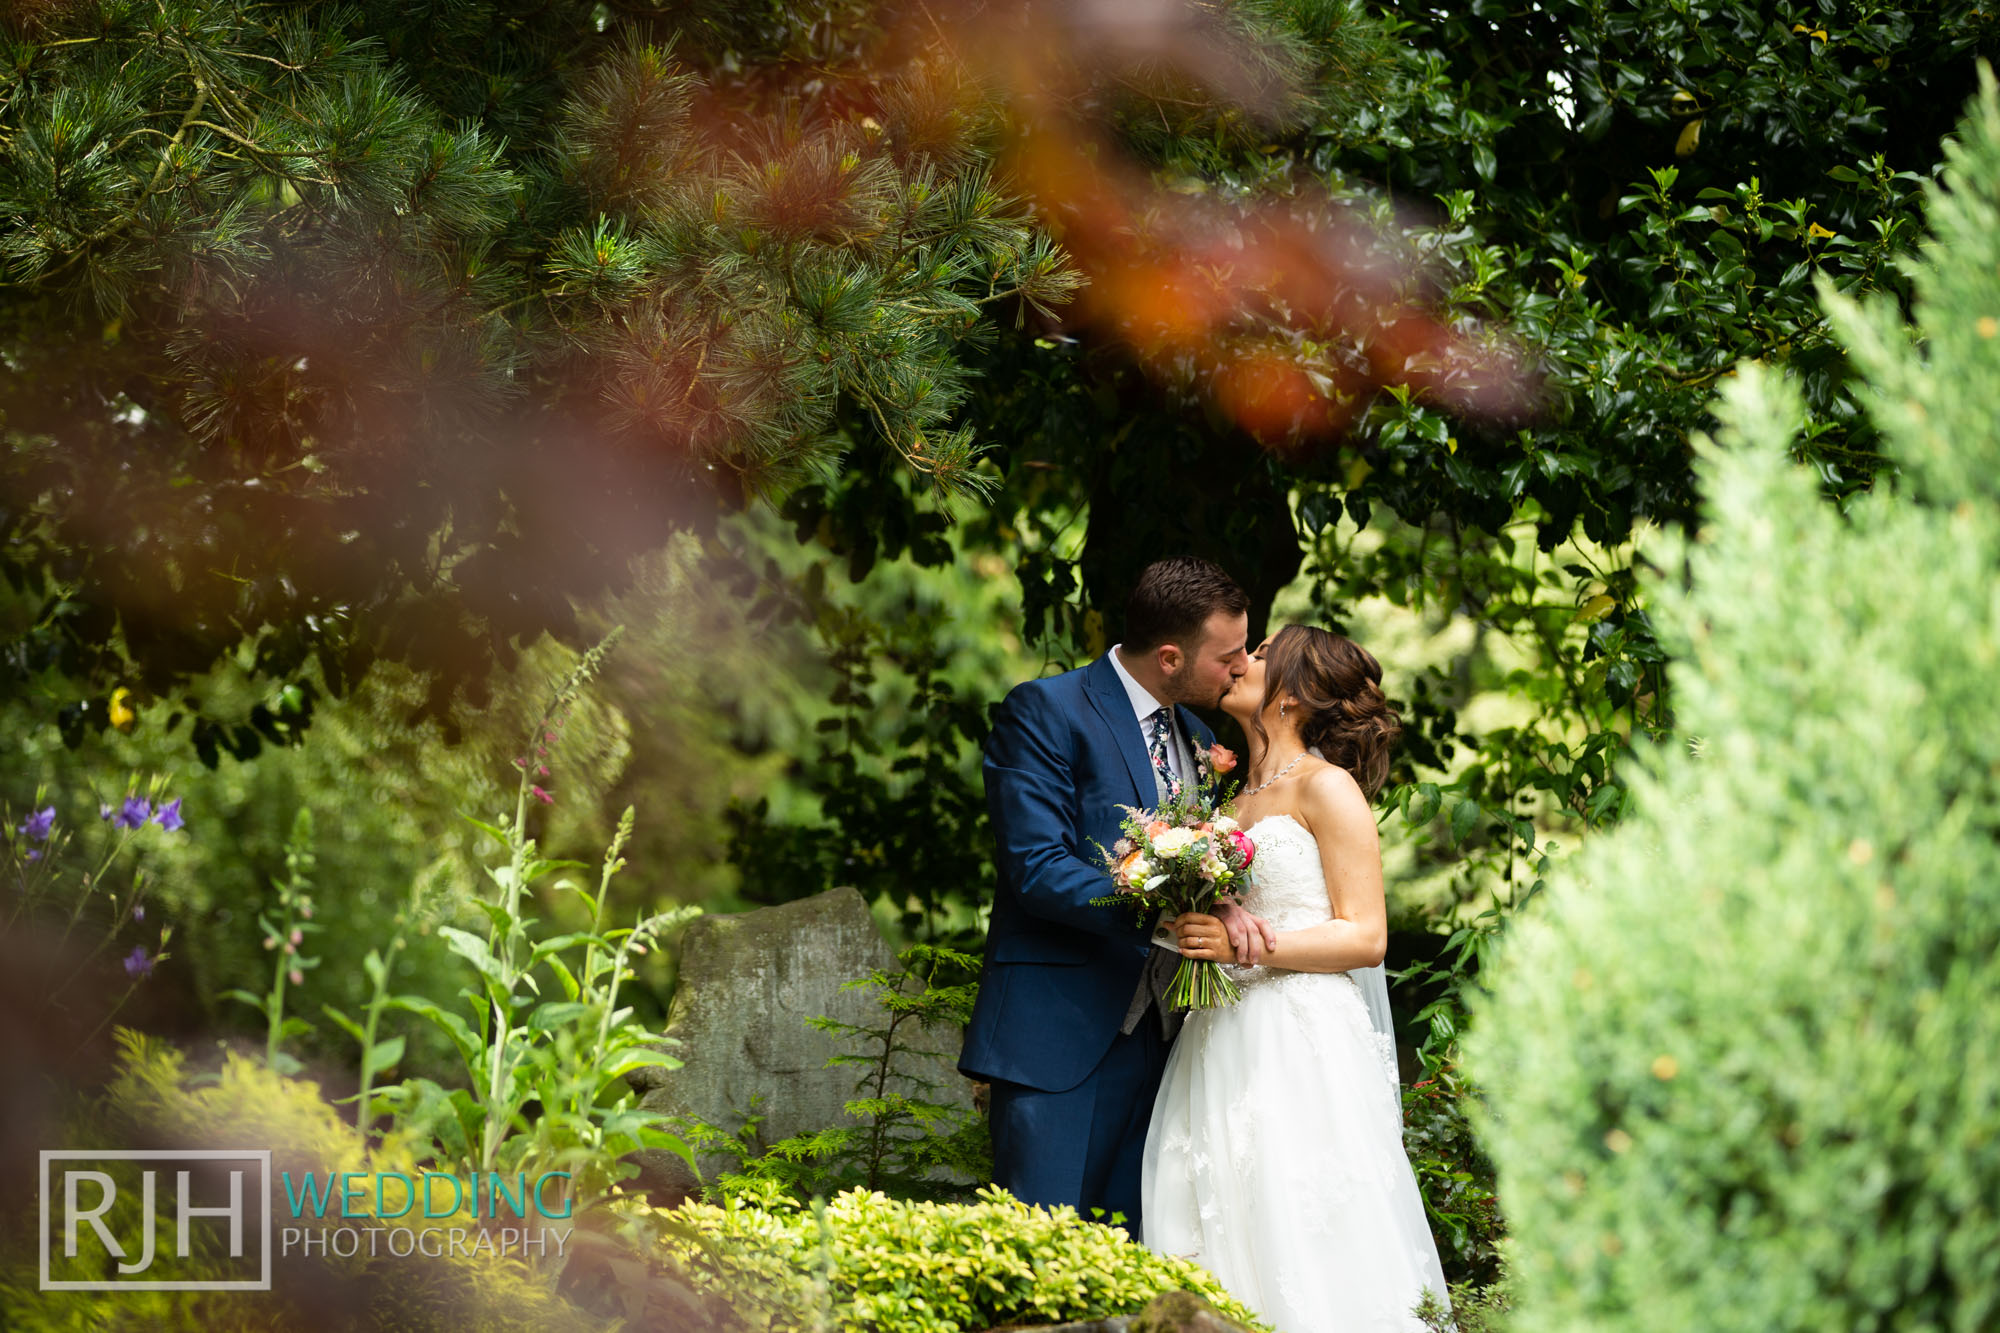 Whirlowbrook Hall Wedding Photography_Jack & Lydia_062_IMG_4415.jpg